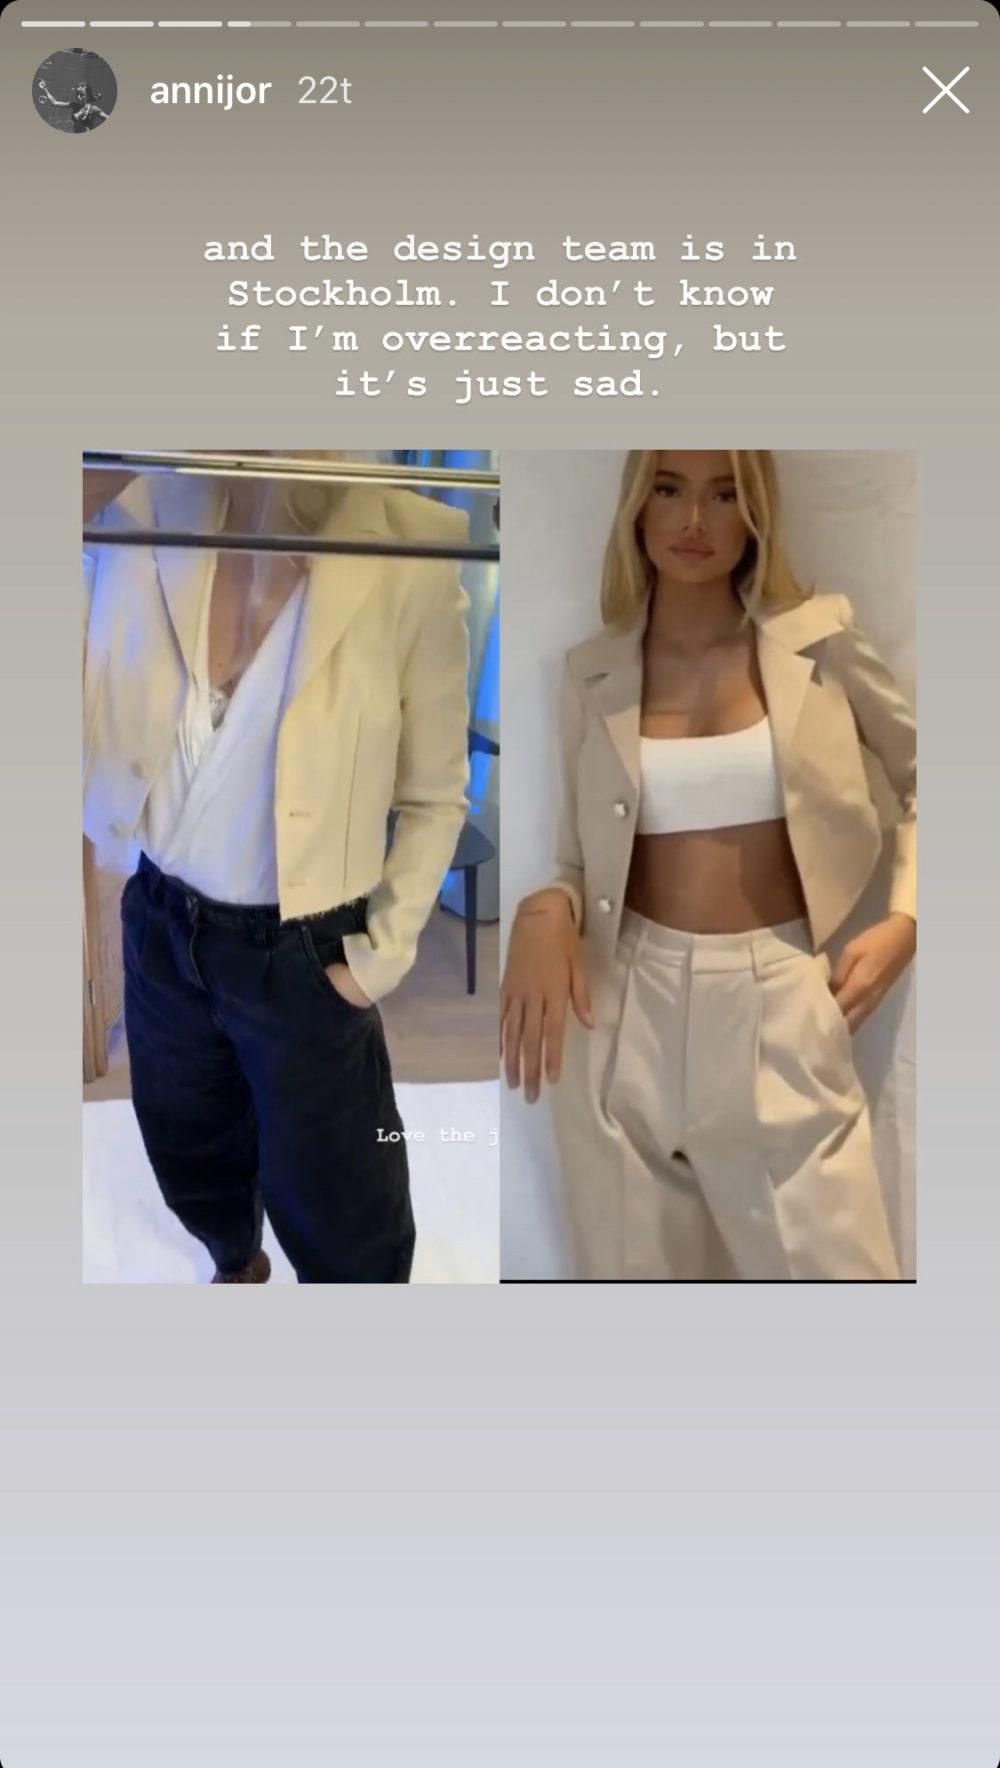 Anniken Jørgensen mener H&M har kopiert designet hennes